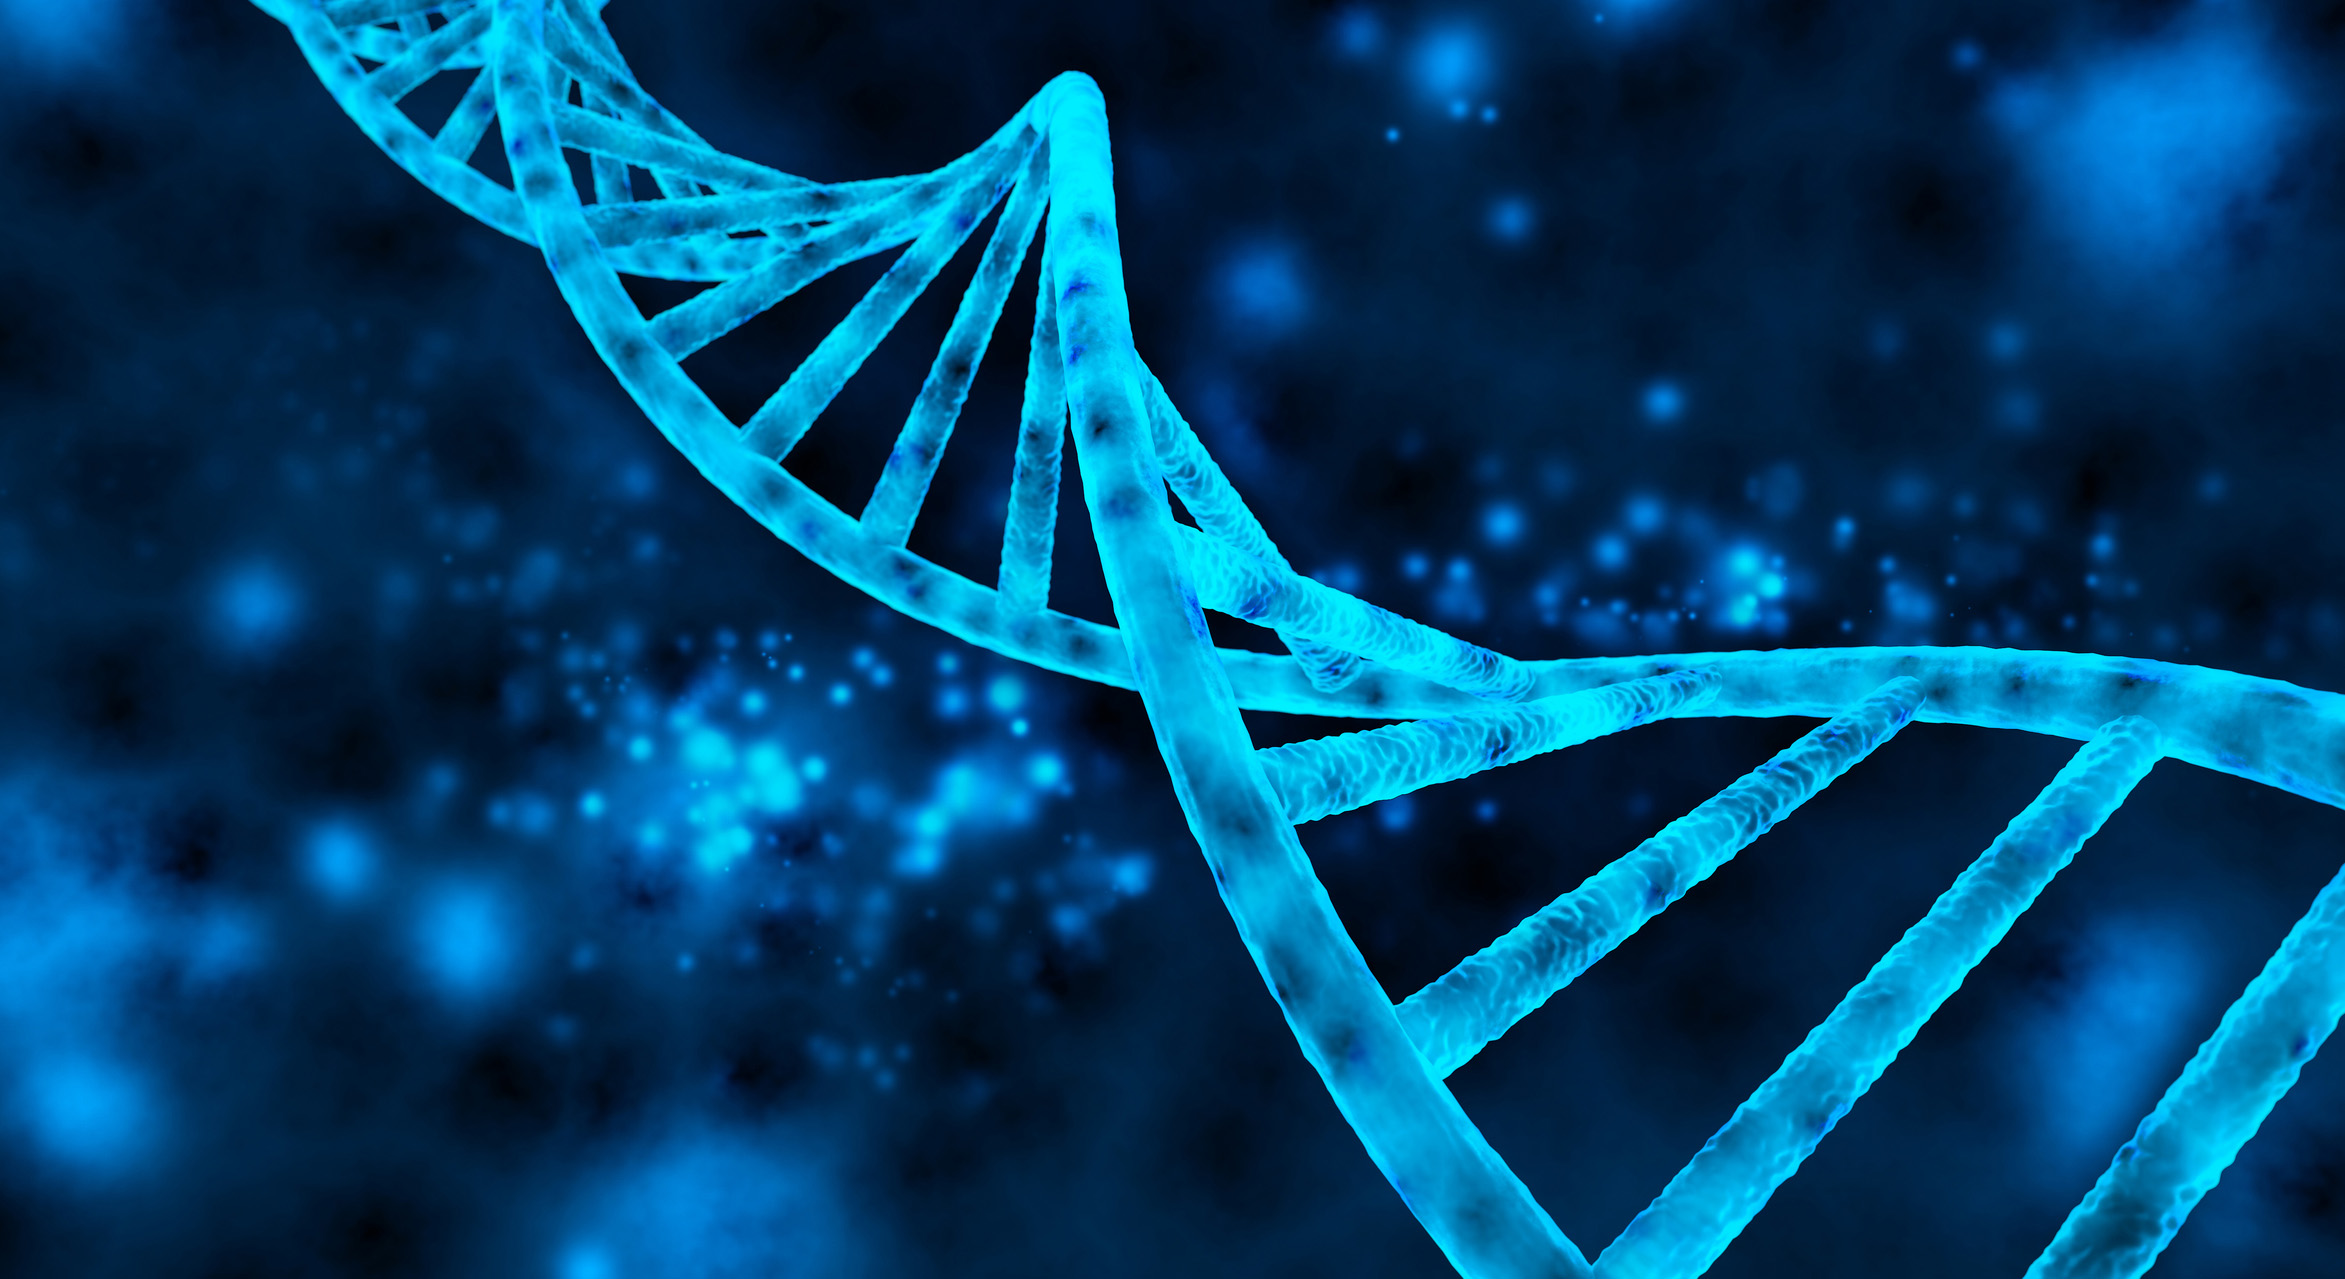 Blue 3D DNA strands with a dark blue background